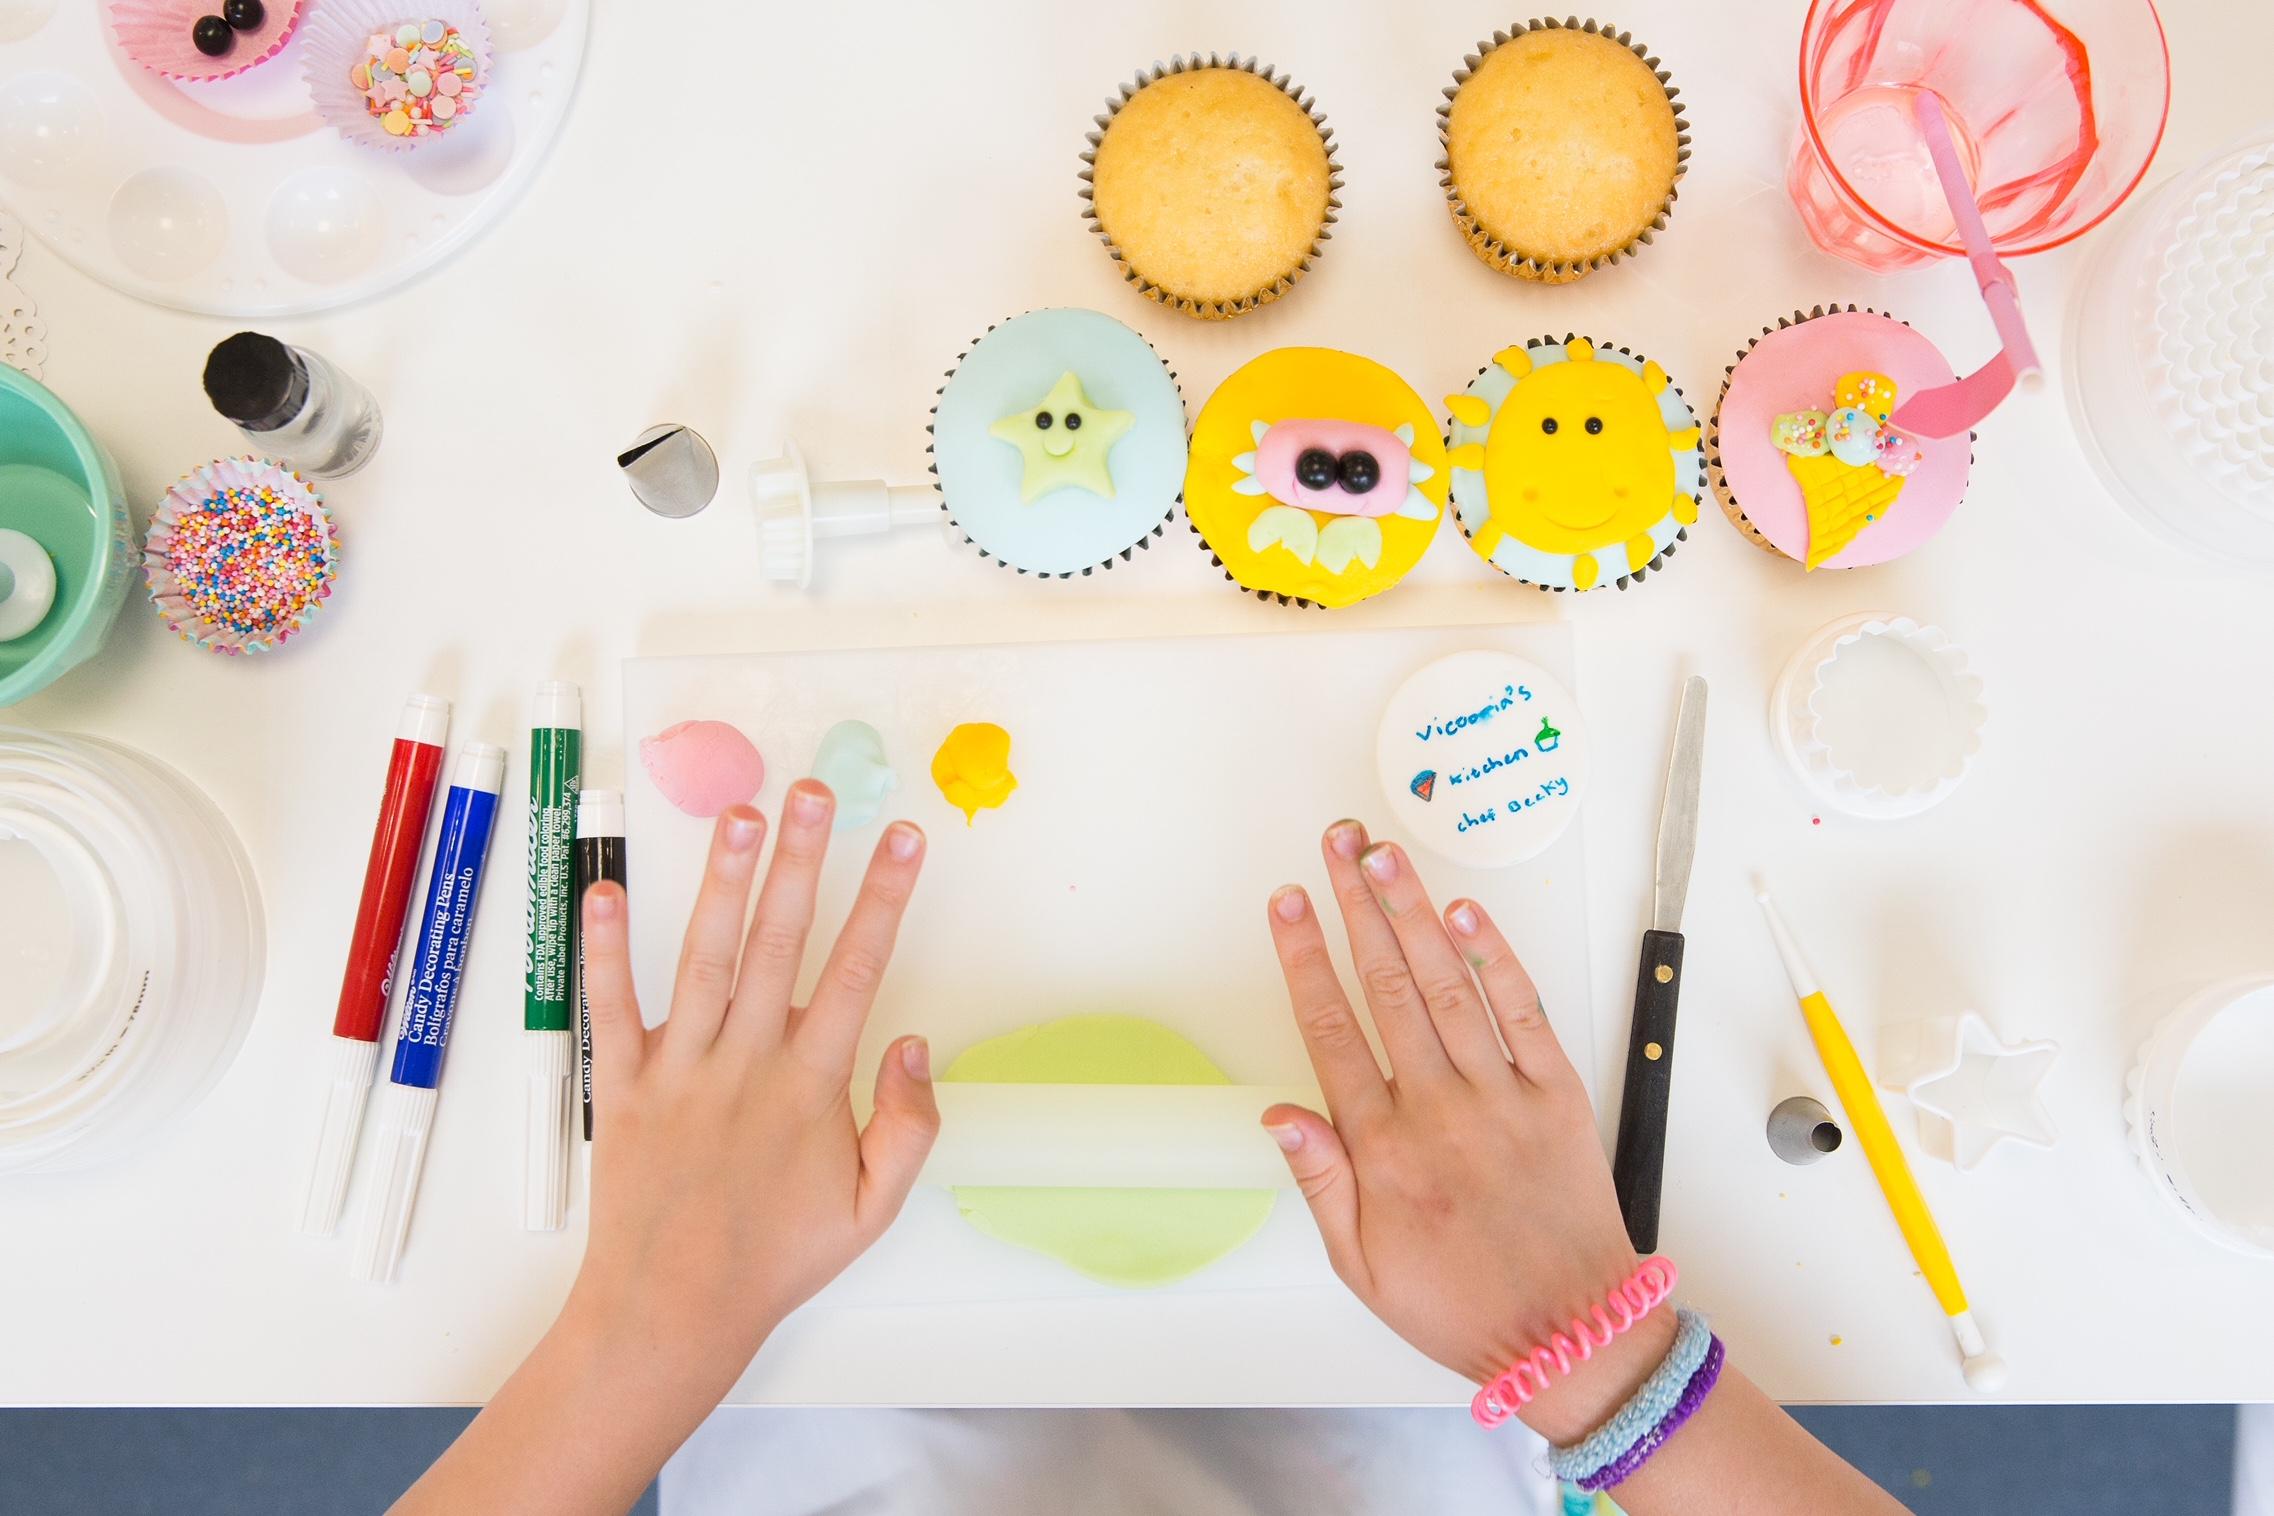 Victorias-Kitchen-Cupcake-decorating-party .JPG